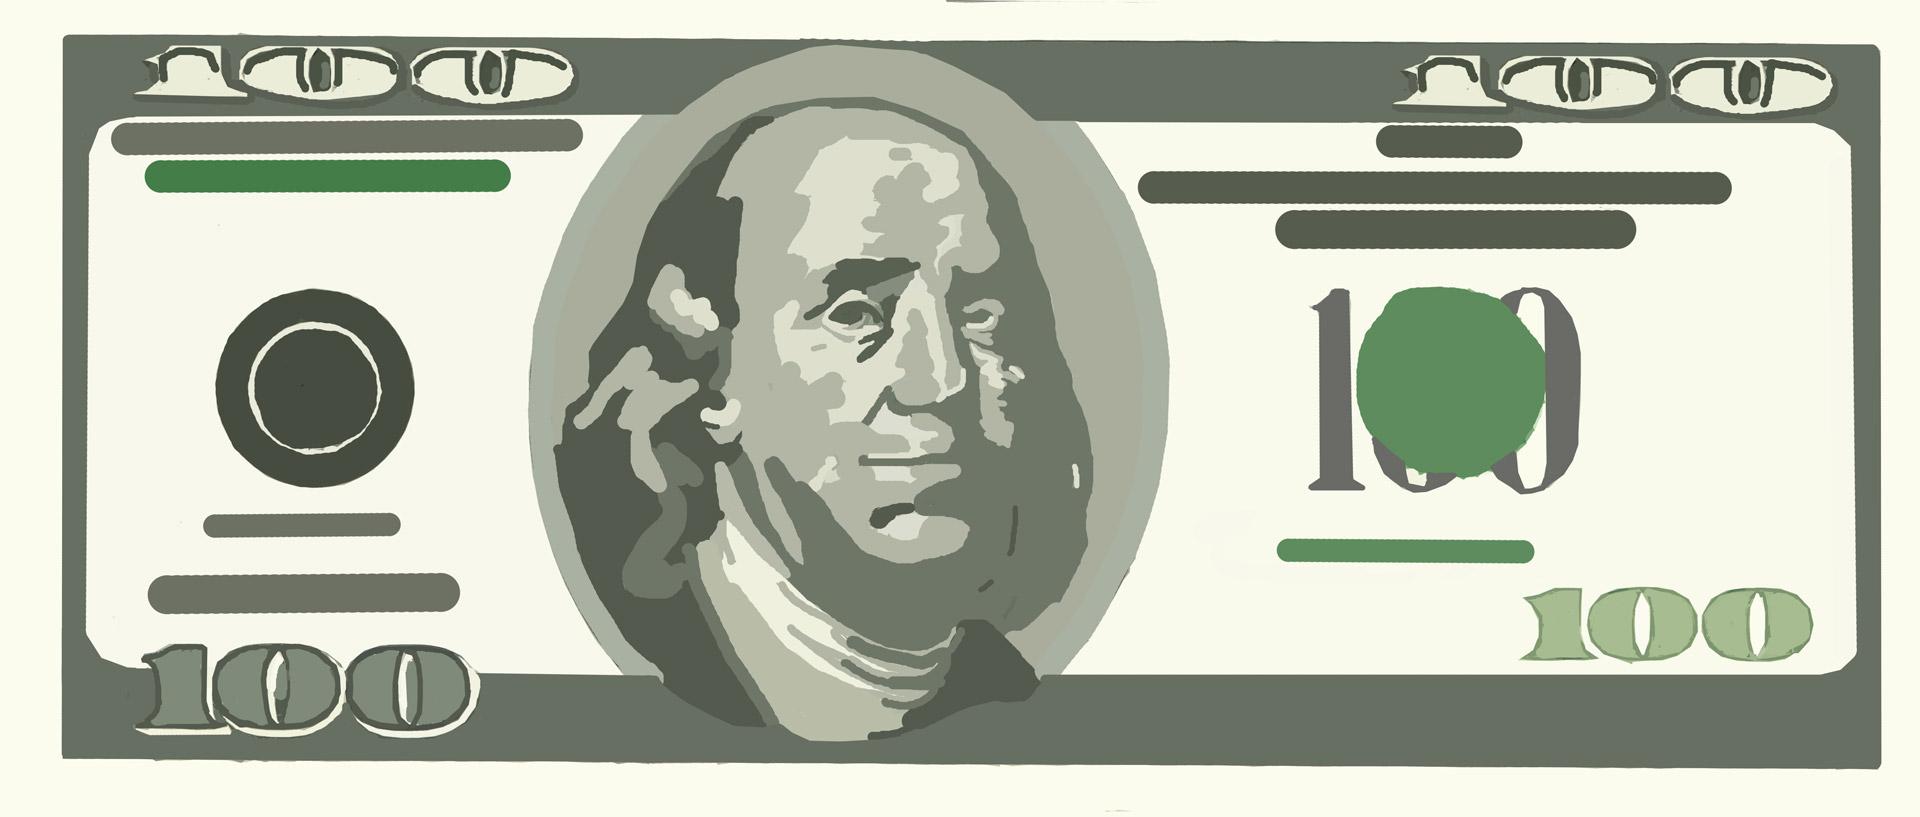 Paper Money Clip Art Free Stock Photo.